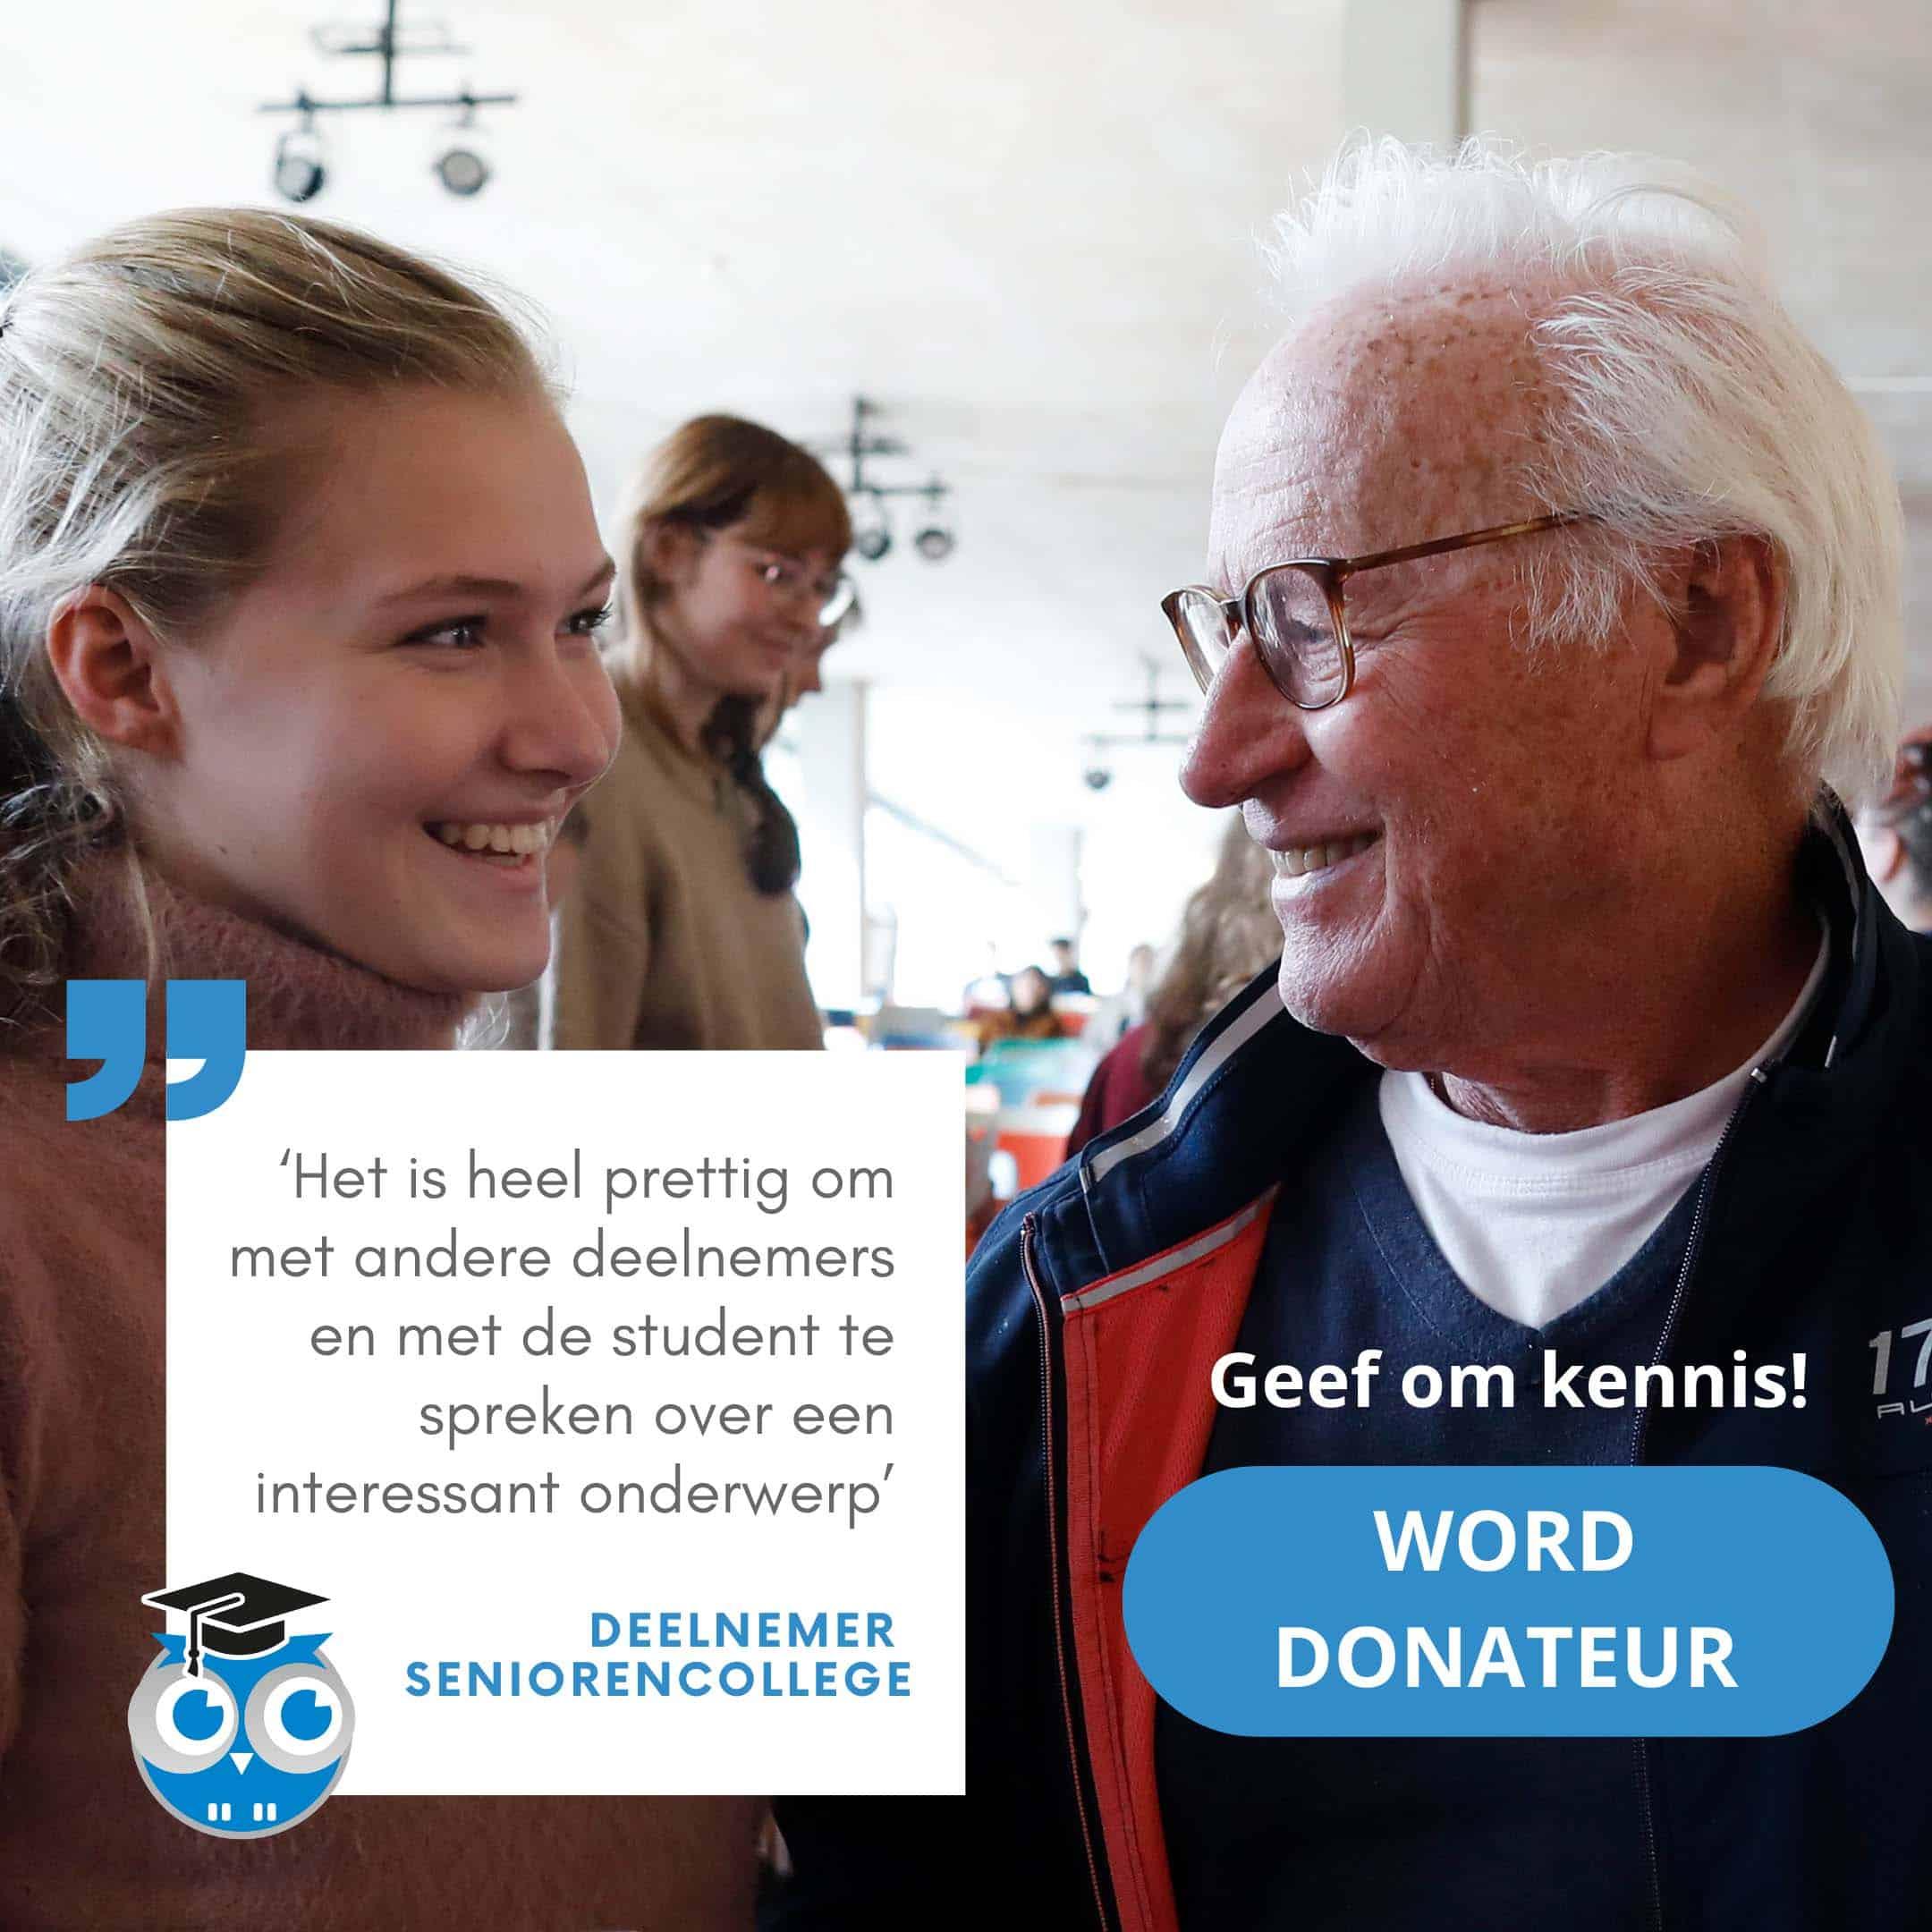 Oproep word donateur: studentdocent en senior in gesprek na een seniorencollege